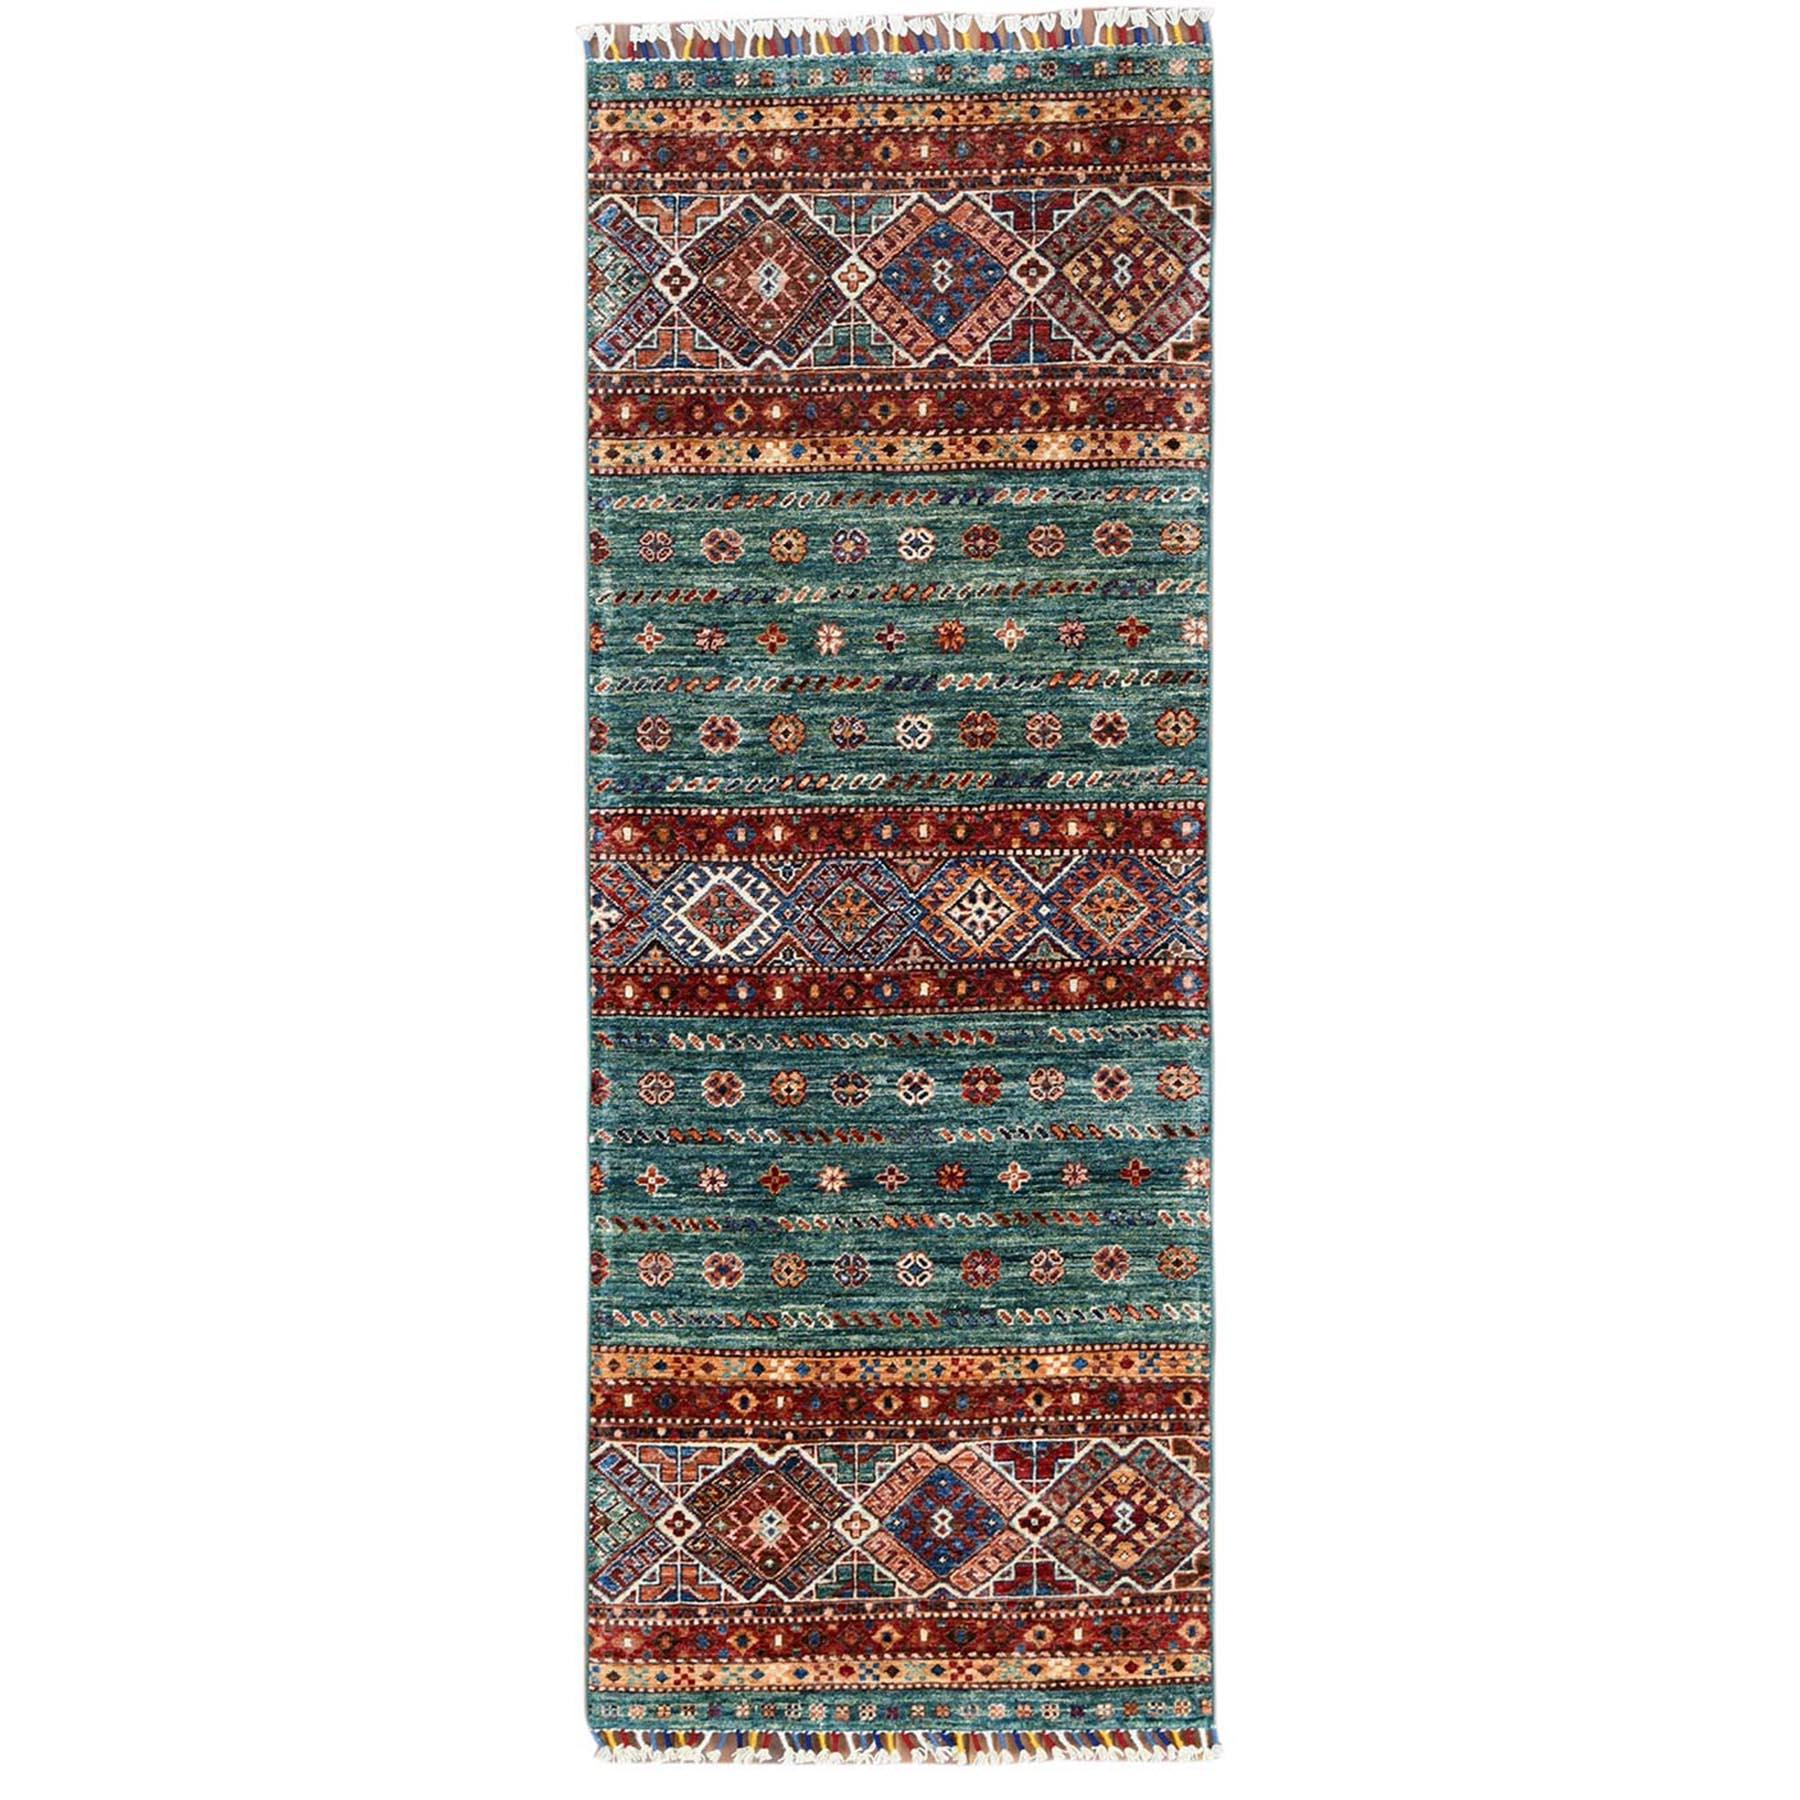 "2'6""X6'10"" Hand Knotted Teal Super Kazak Khorjin Design With Colorful Tassles Pure Wool Oriental Runner Rug moa60bb7"